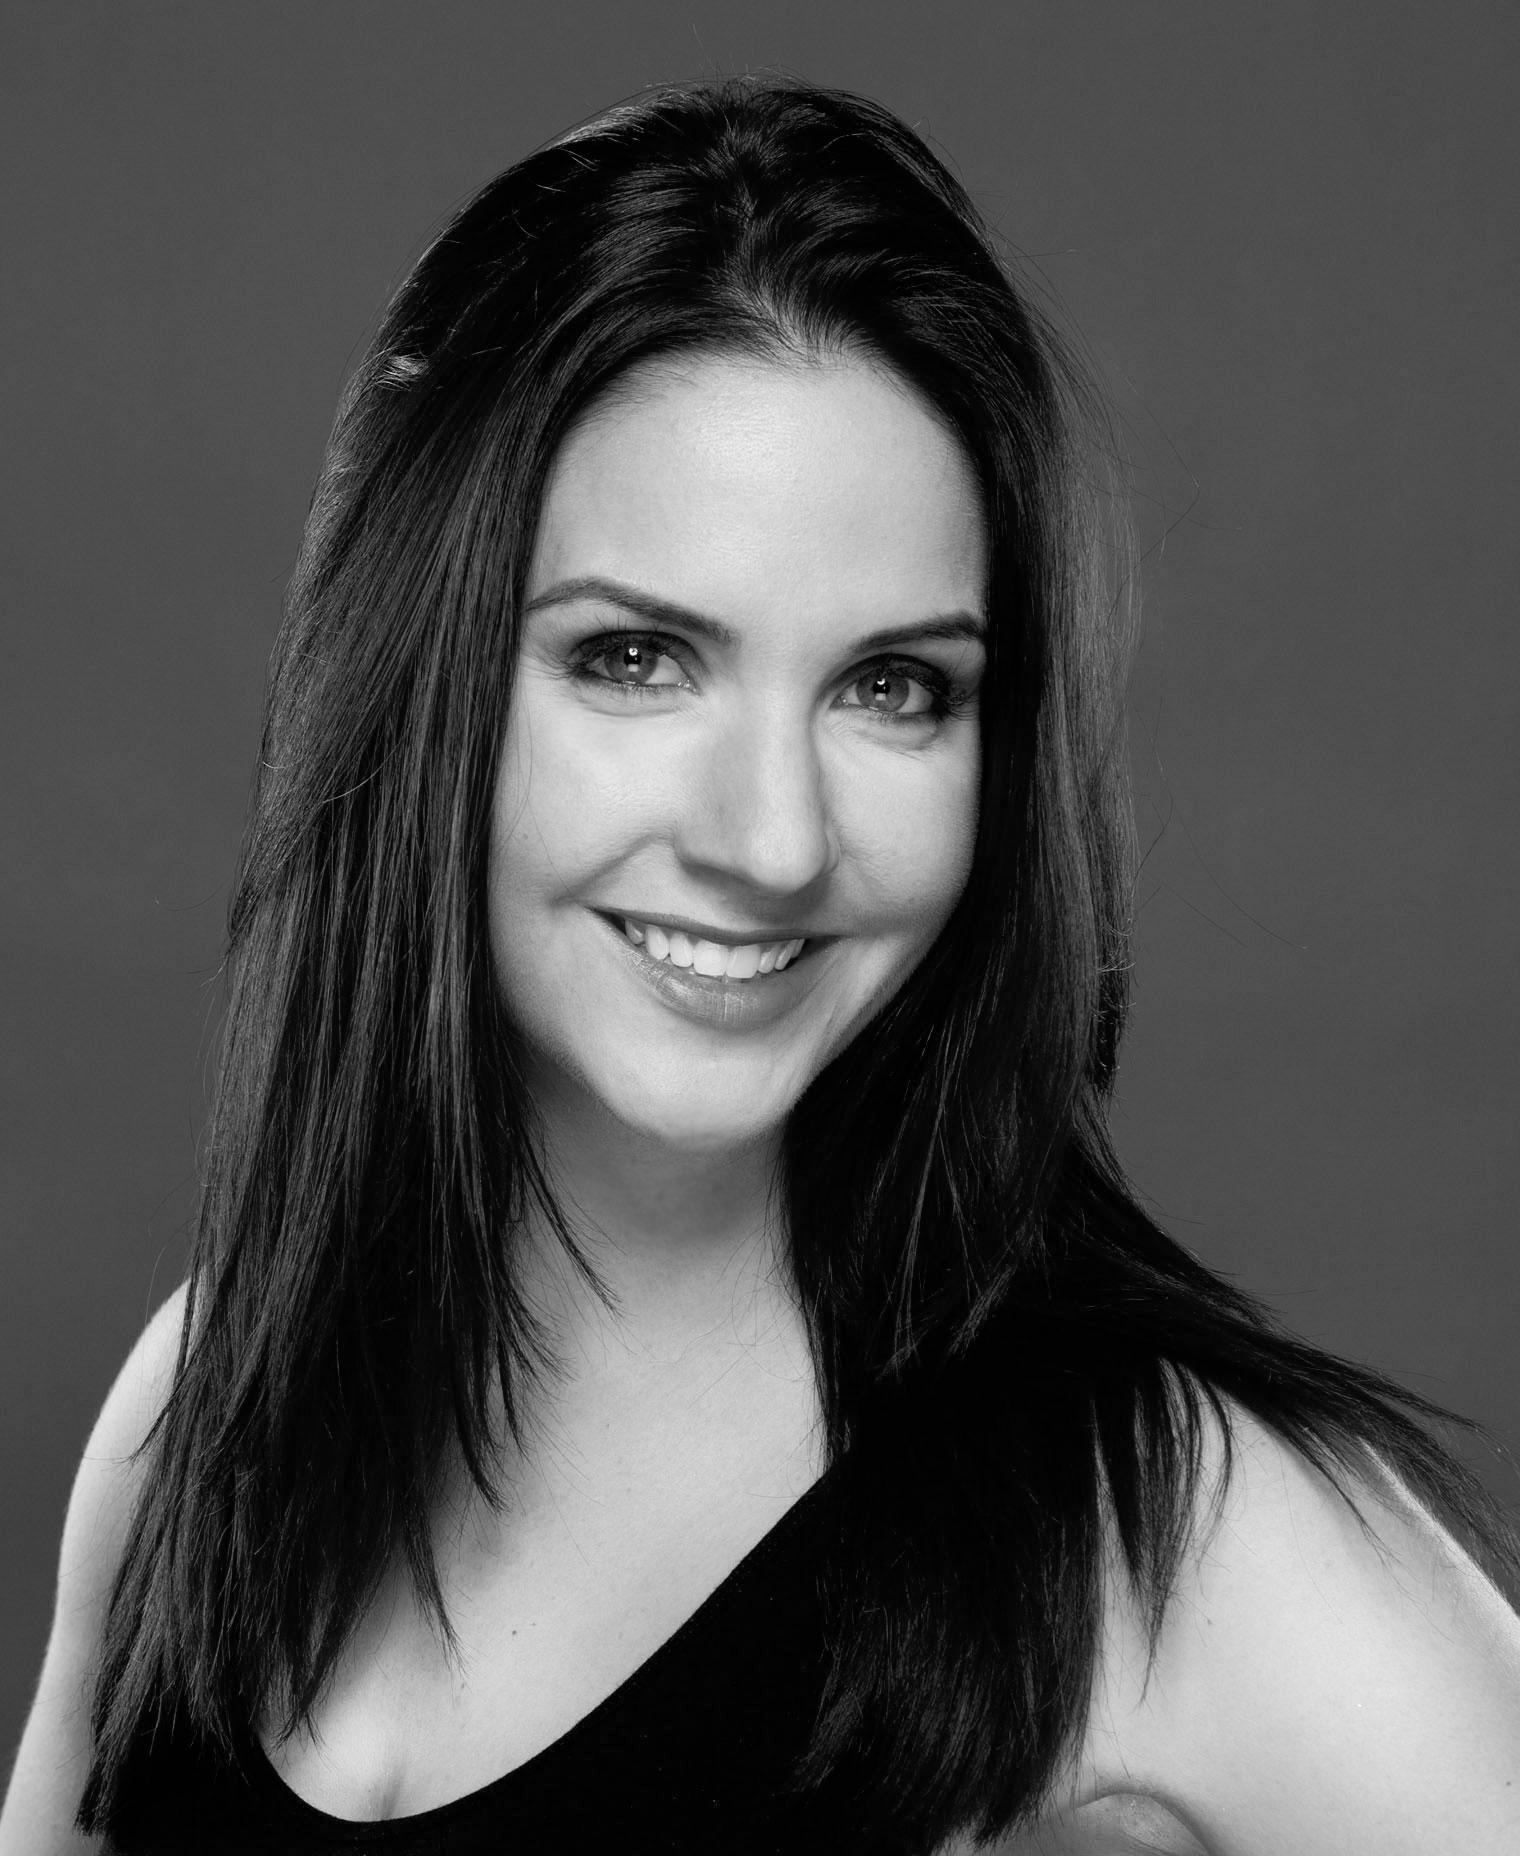 Katie Bento